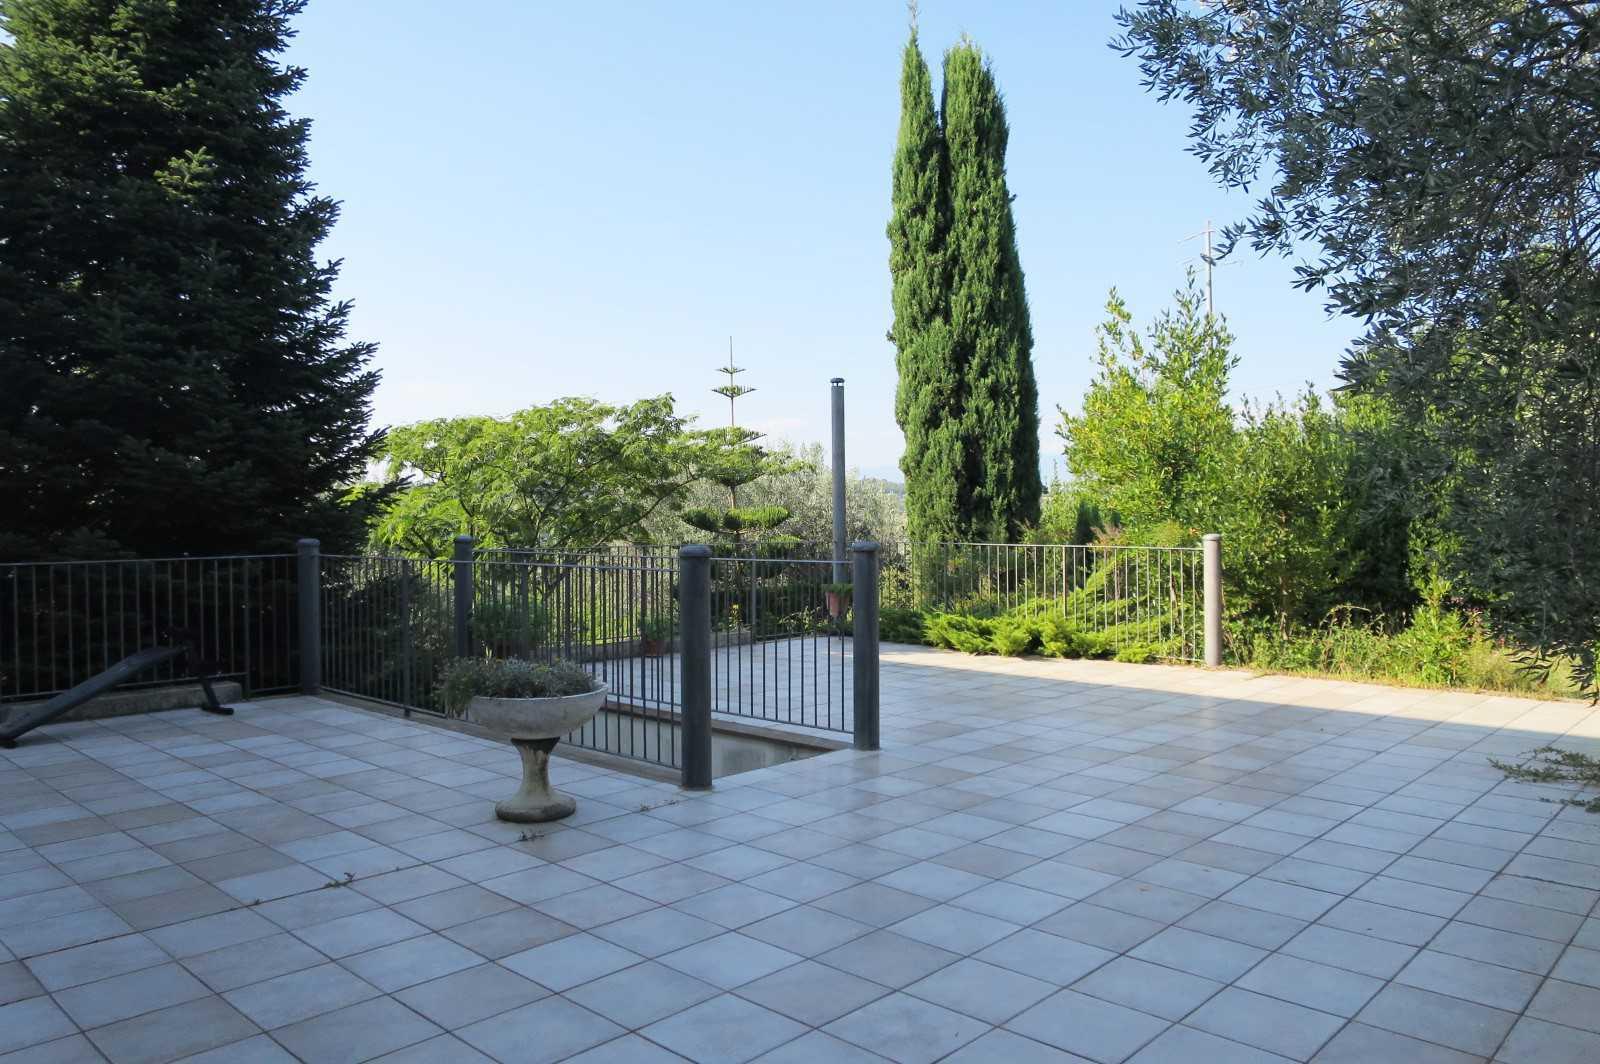 Villa Villa in vendita Atri (TE), Villa Paola - Atri - EUR 471.071 230